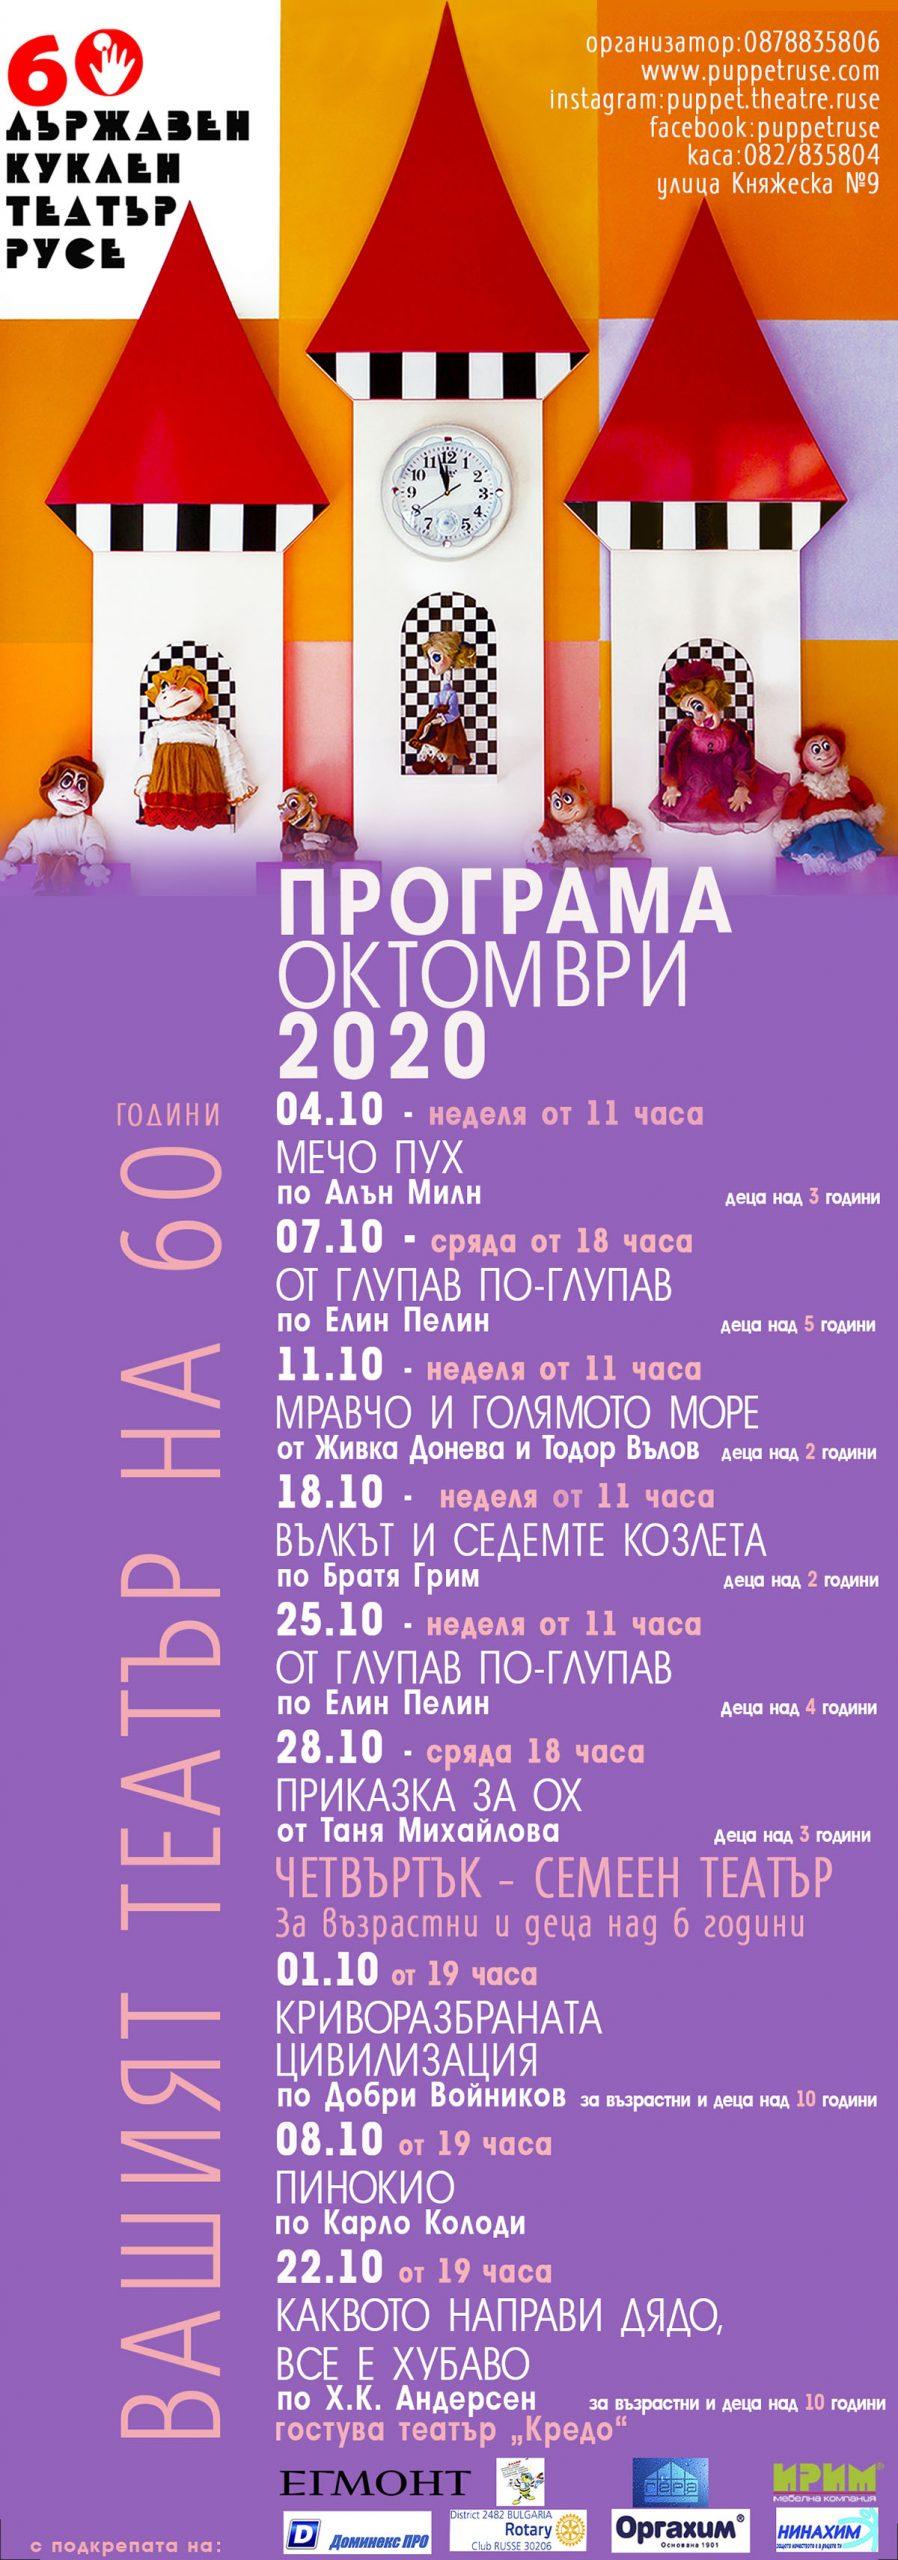 флаерОКТОМВРИ2020-72